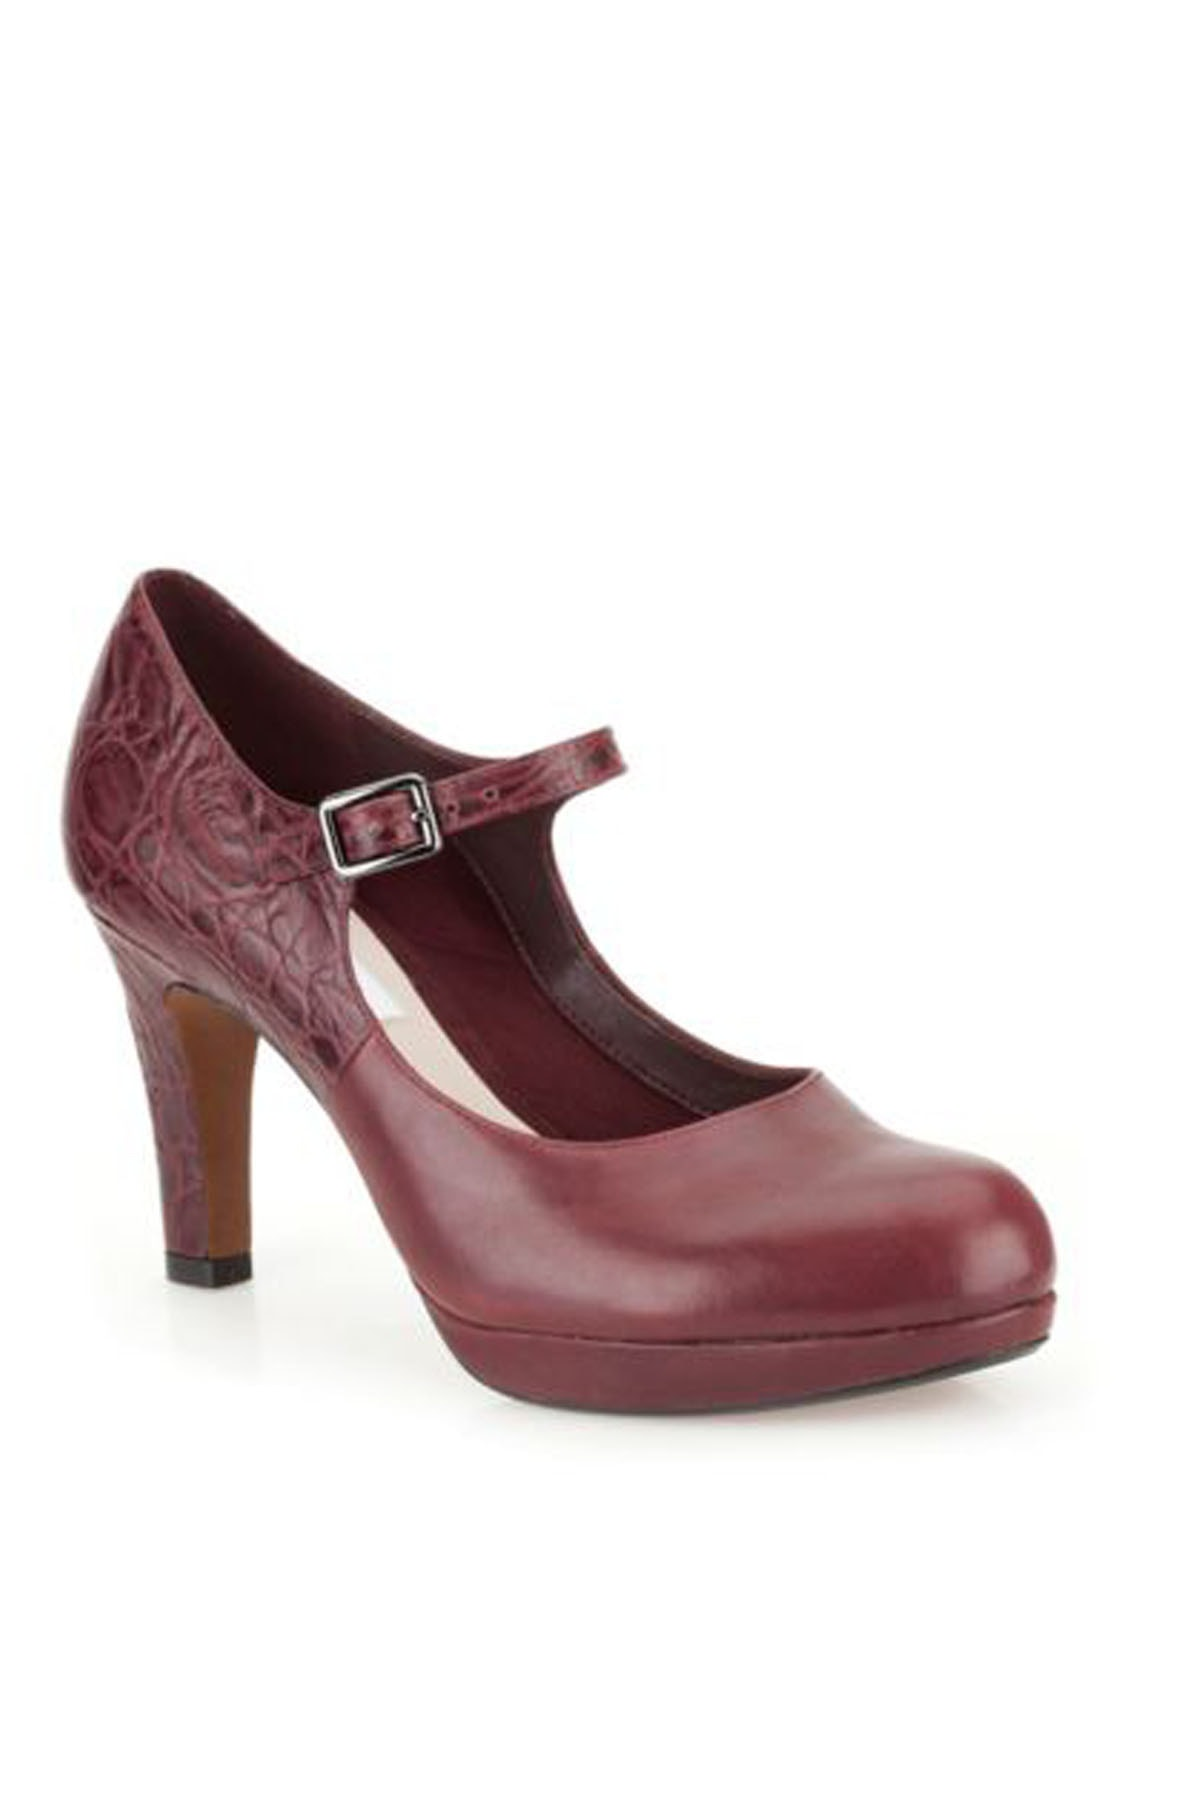 CLARKS Kadın Angıe Kendra Topuklu Ayakkabı 1